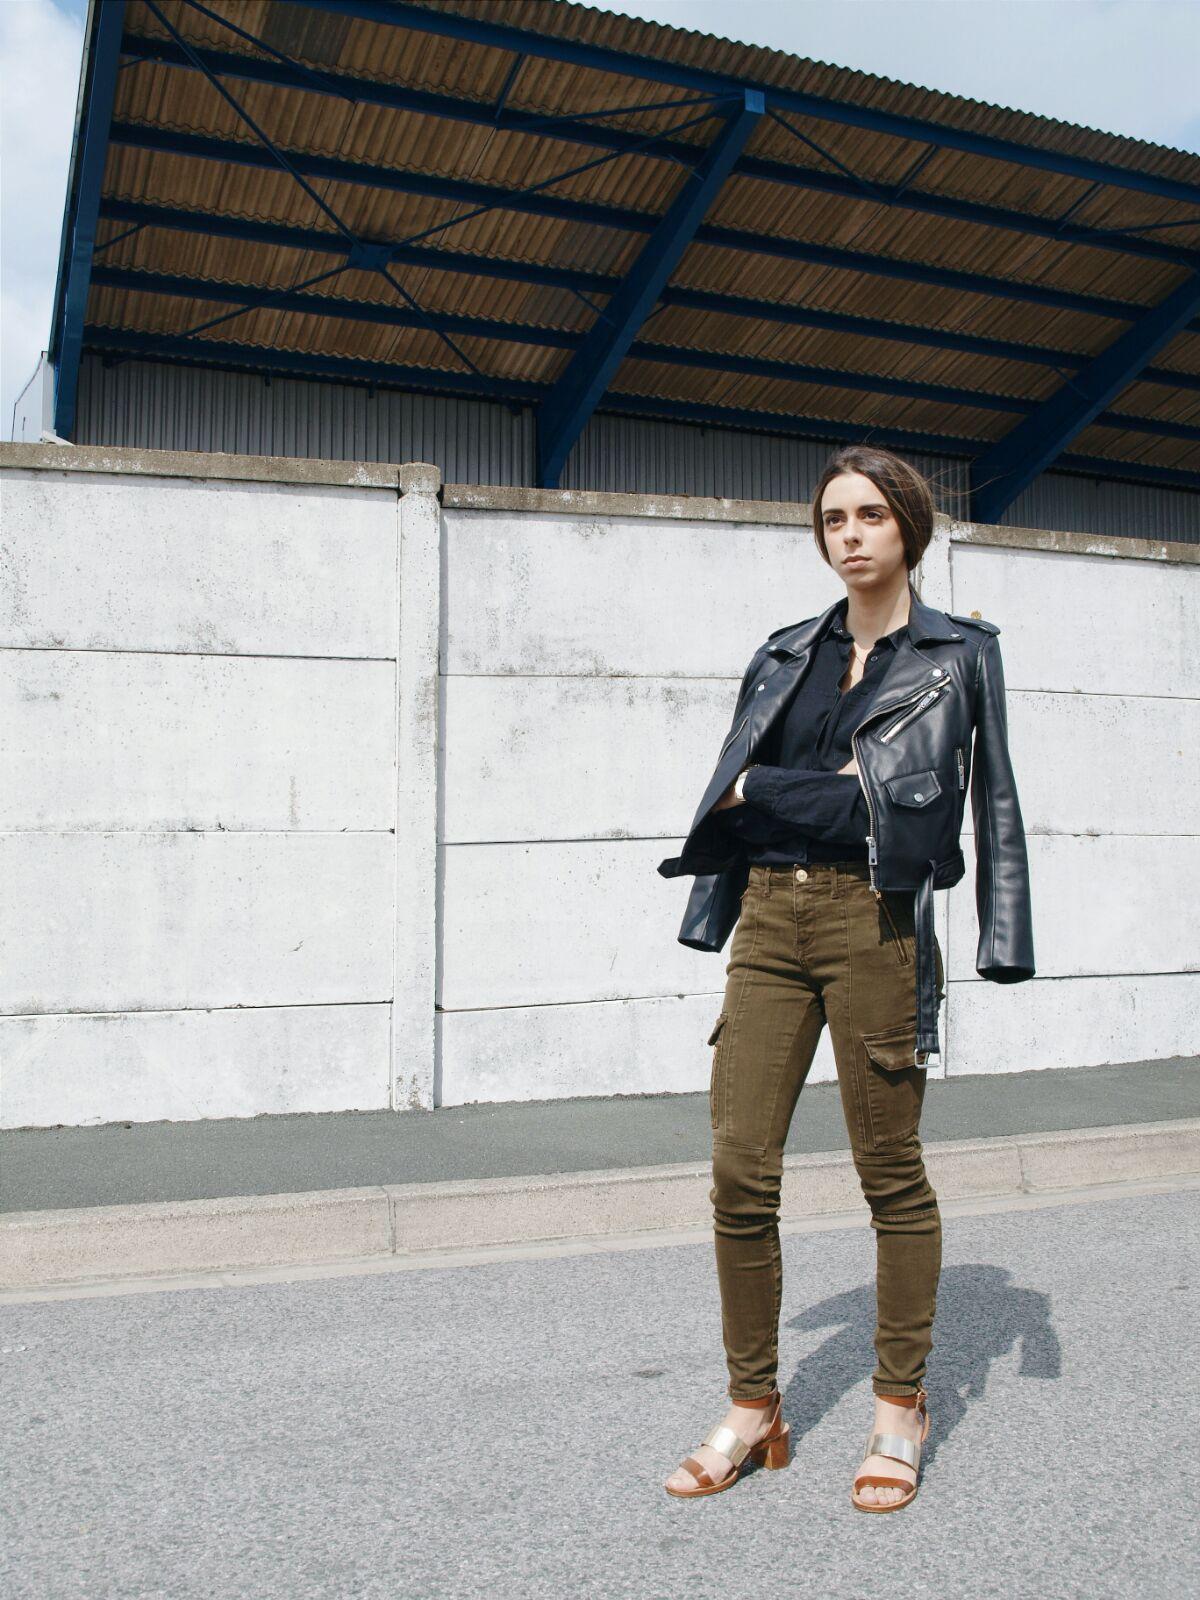 perfecto-and-cargo-coastalandco-blog-zara-sandals-fashion-woman-kaki-jeans